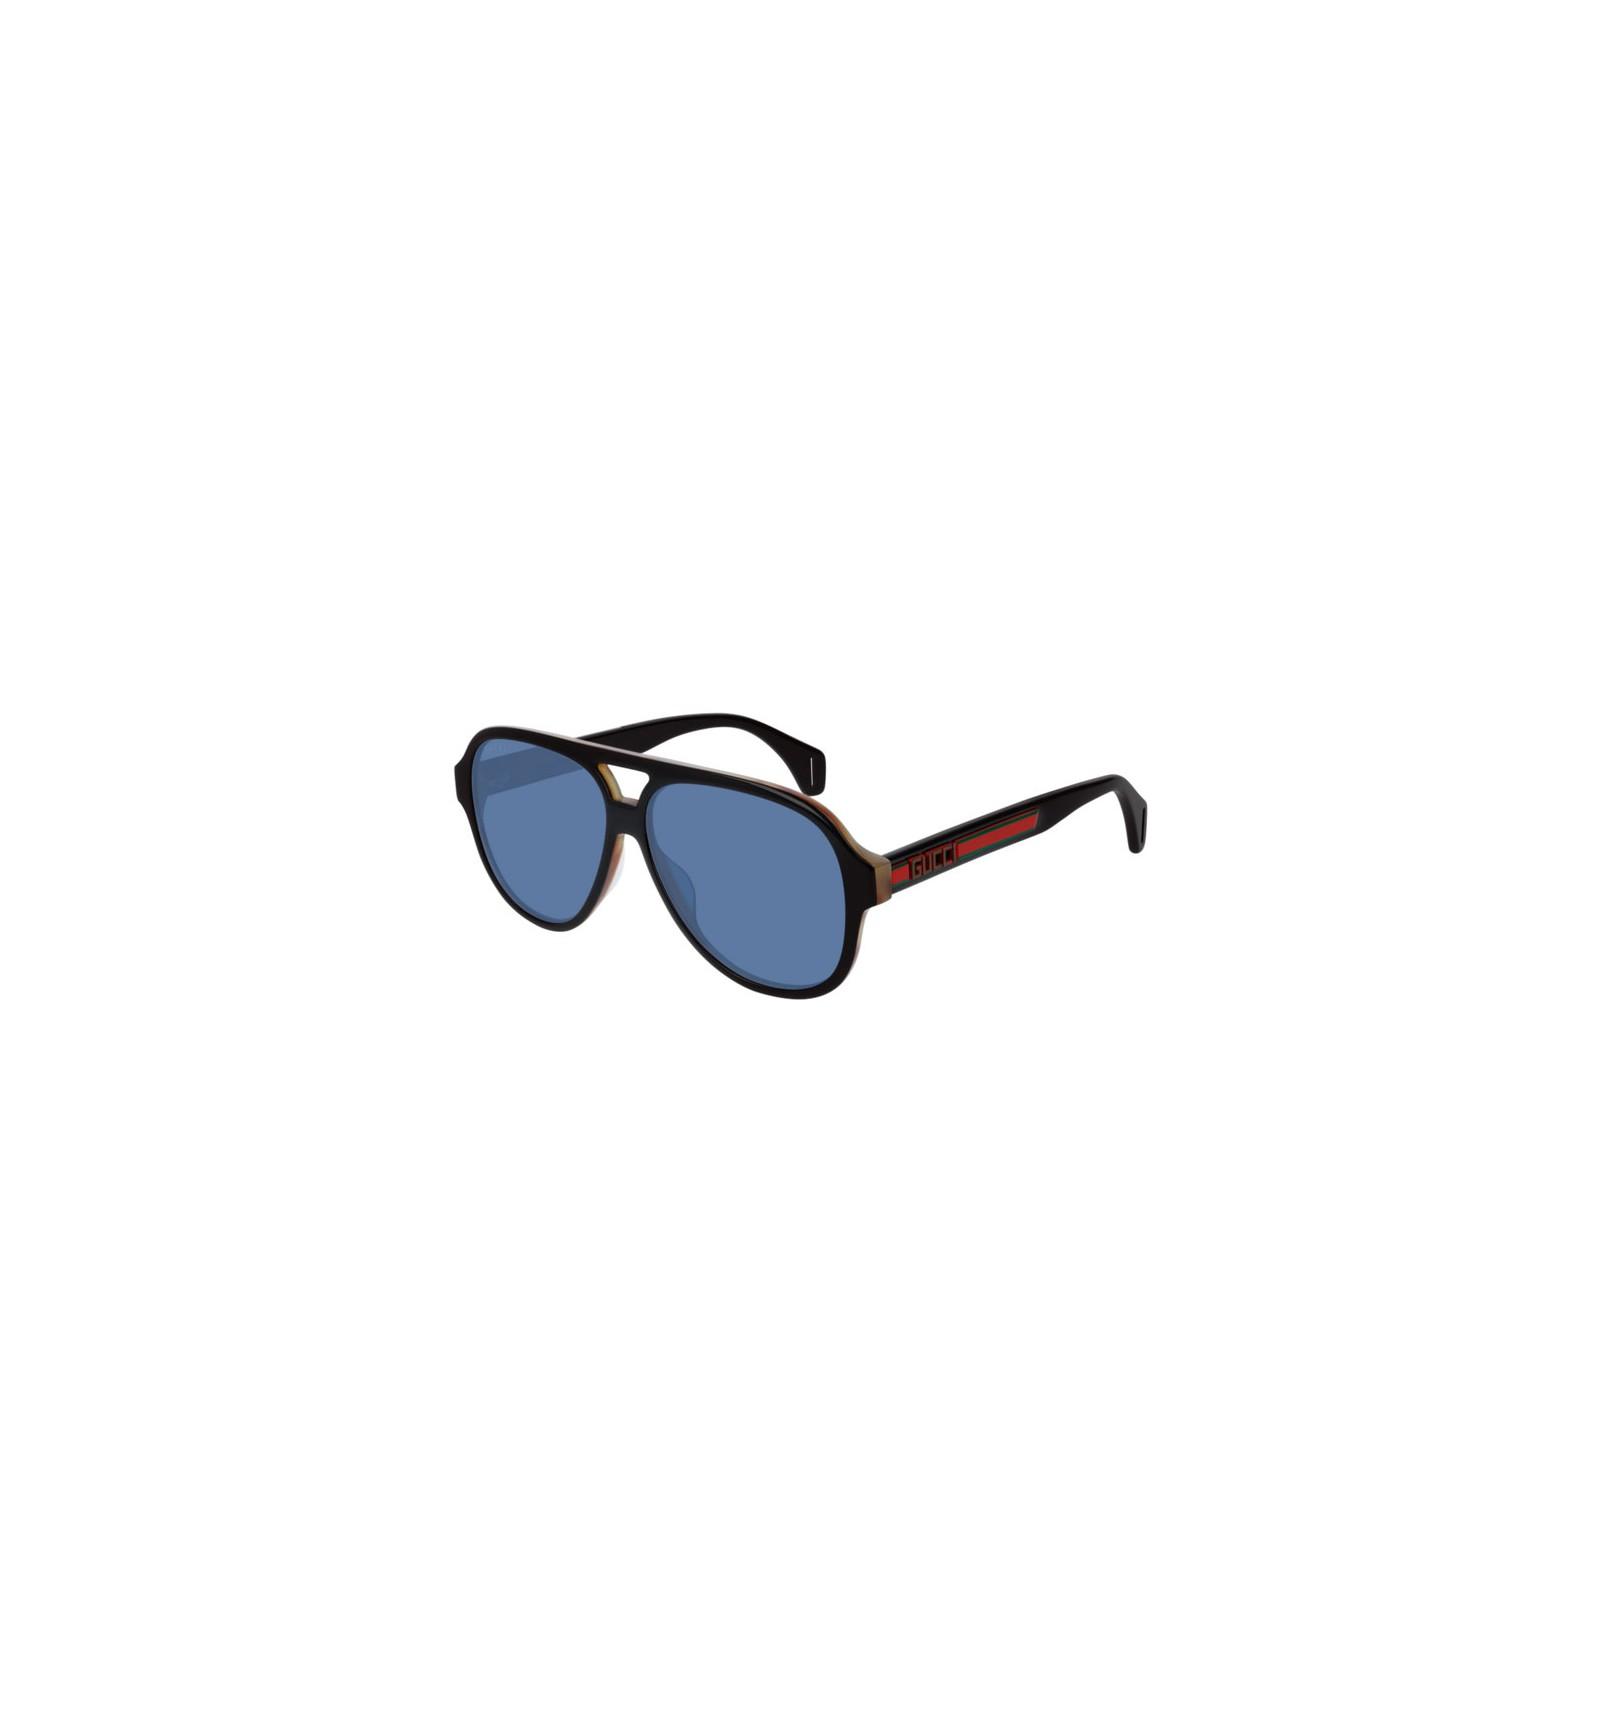 3bcc2fc2df Nuevo 2019 Nuevo Gafas de Sol GUCCI GG0463S Black - Blue (004)